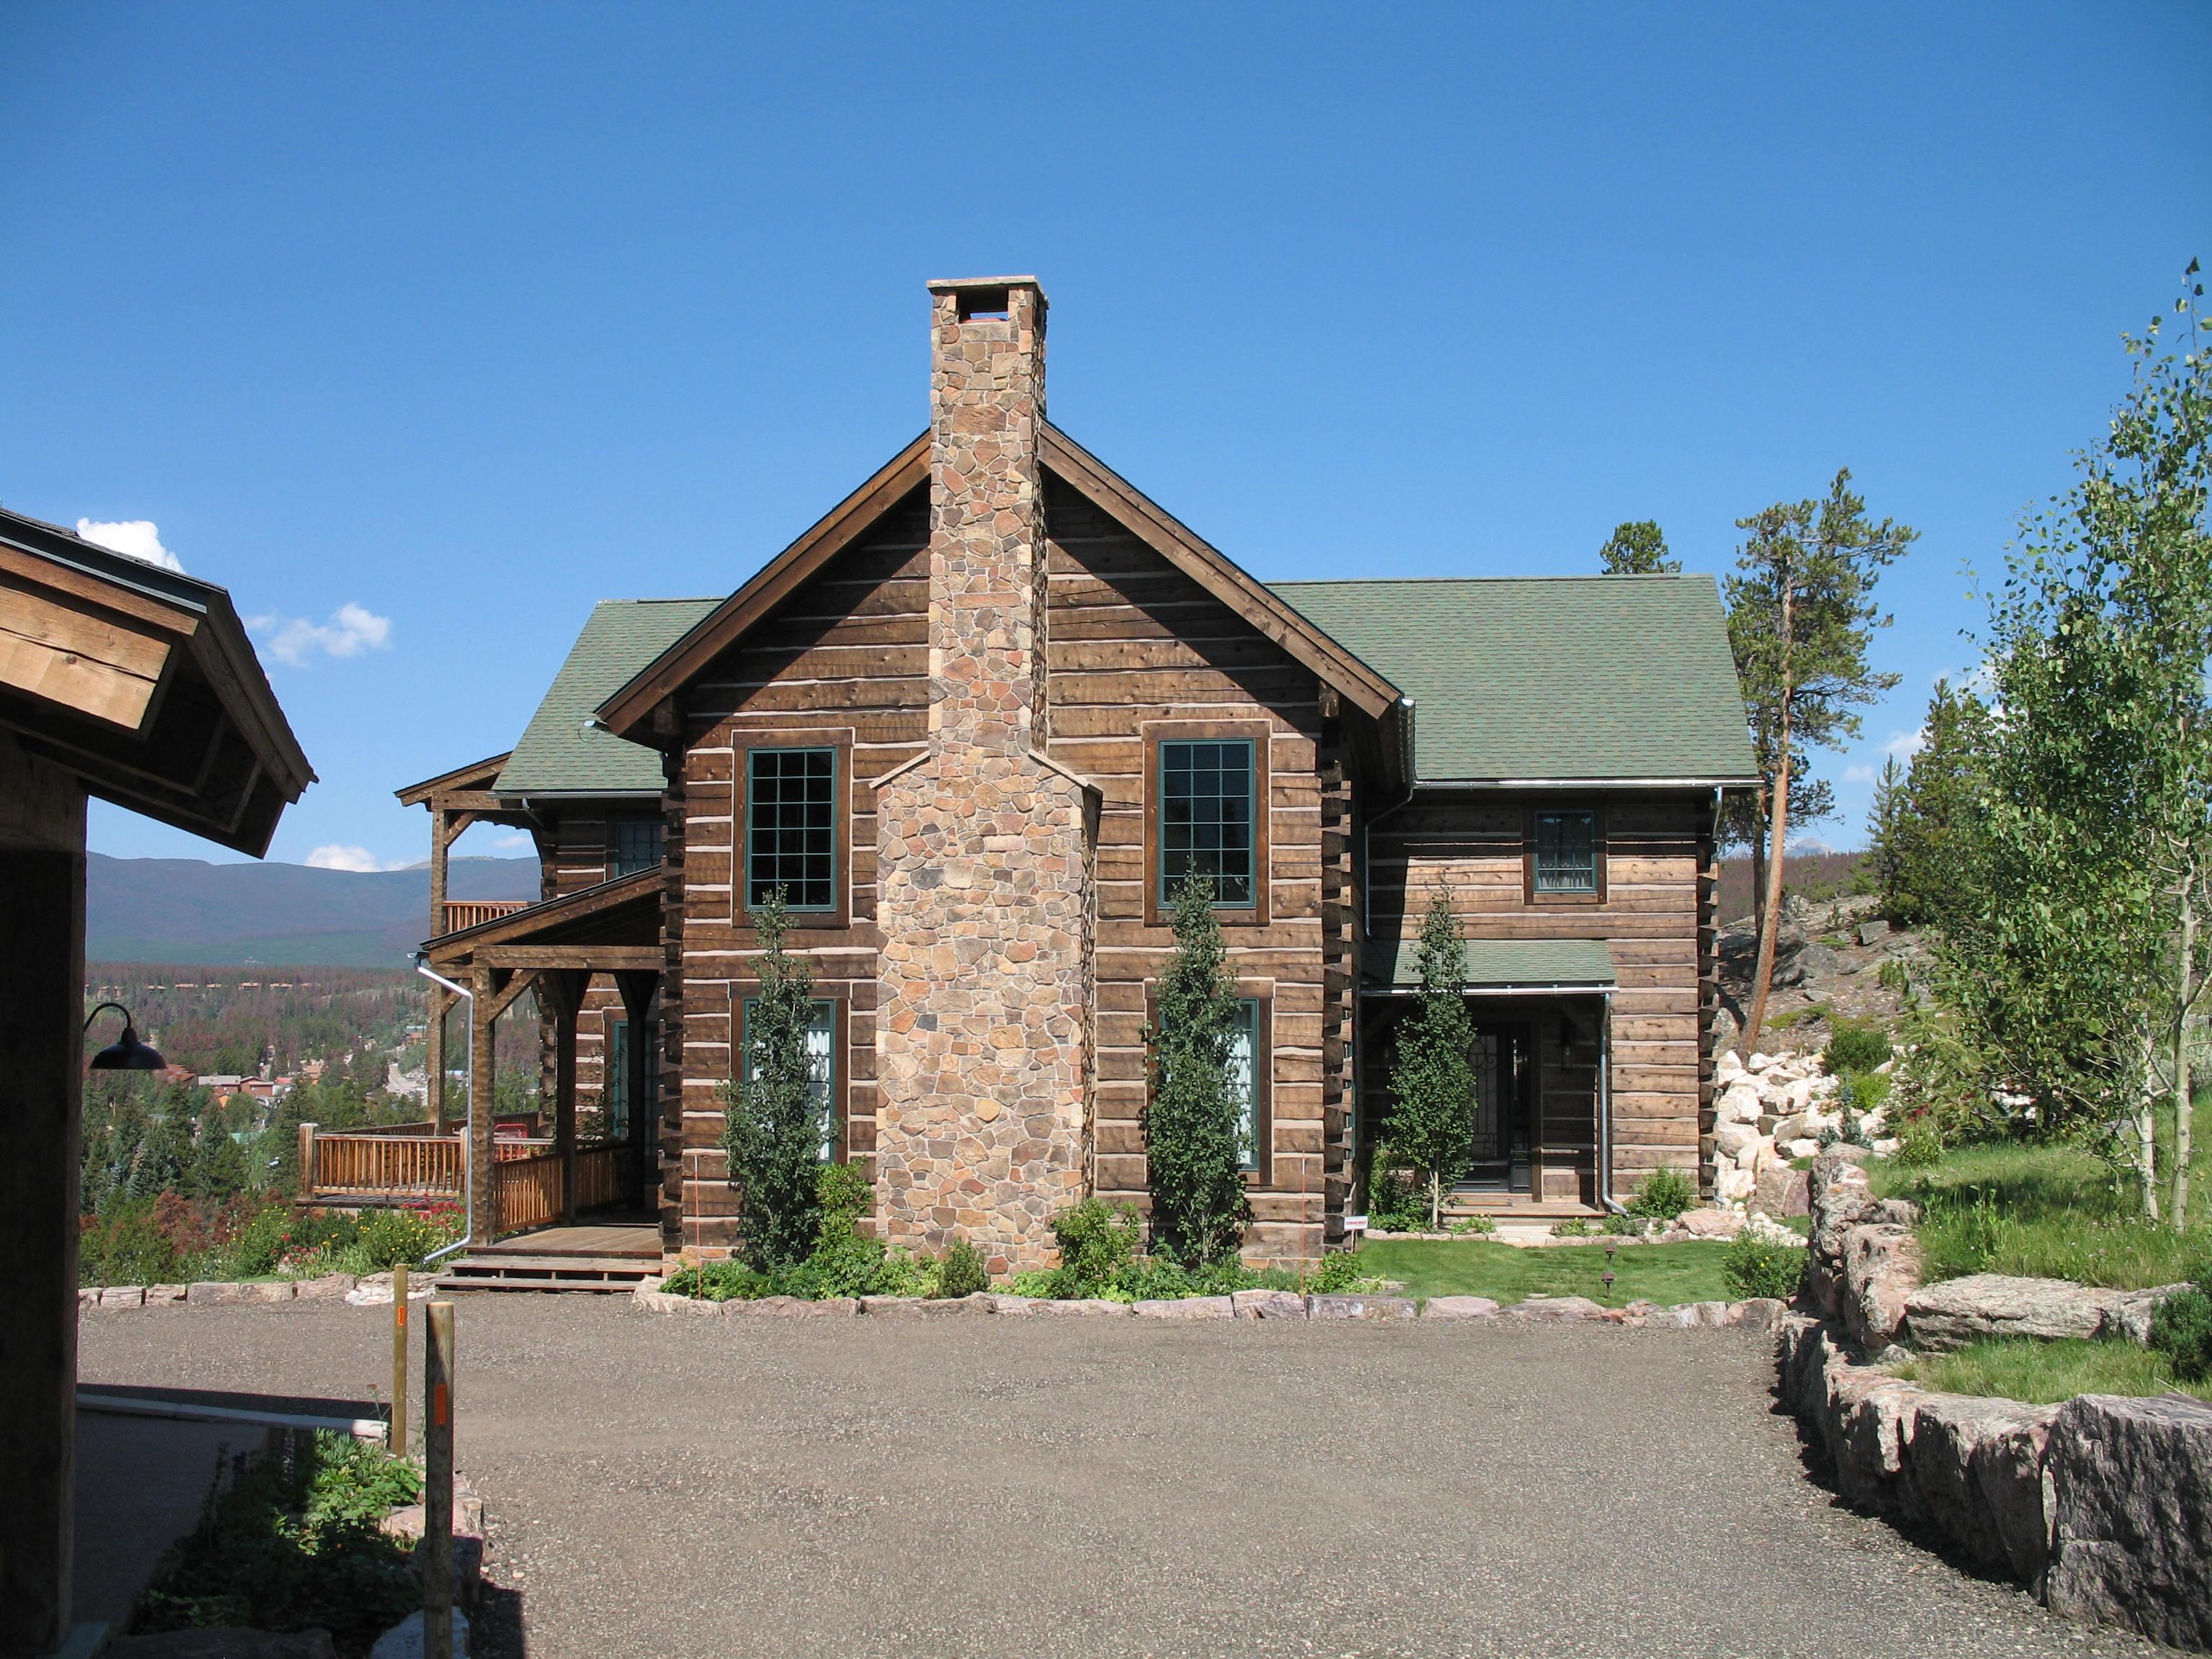 Tim Allen Residence - Exterior #1